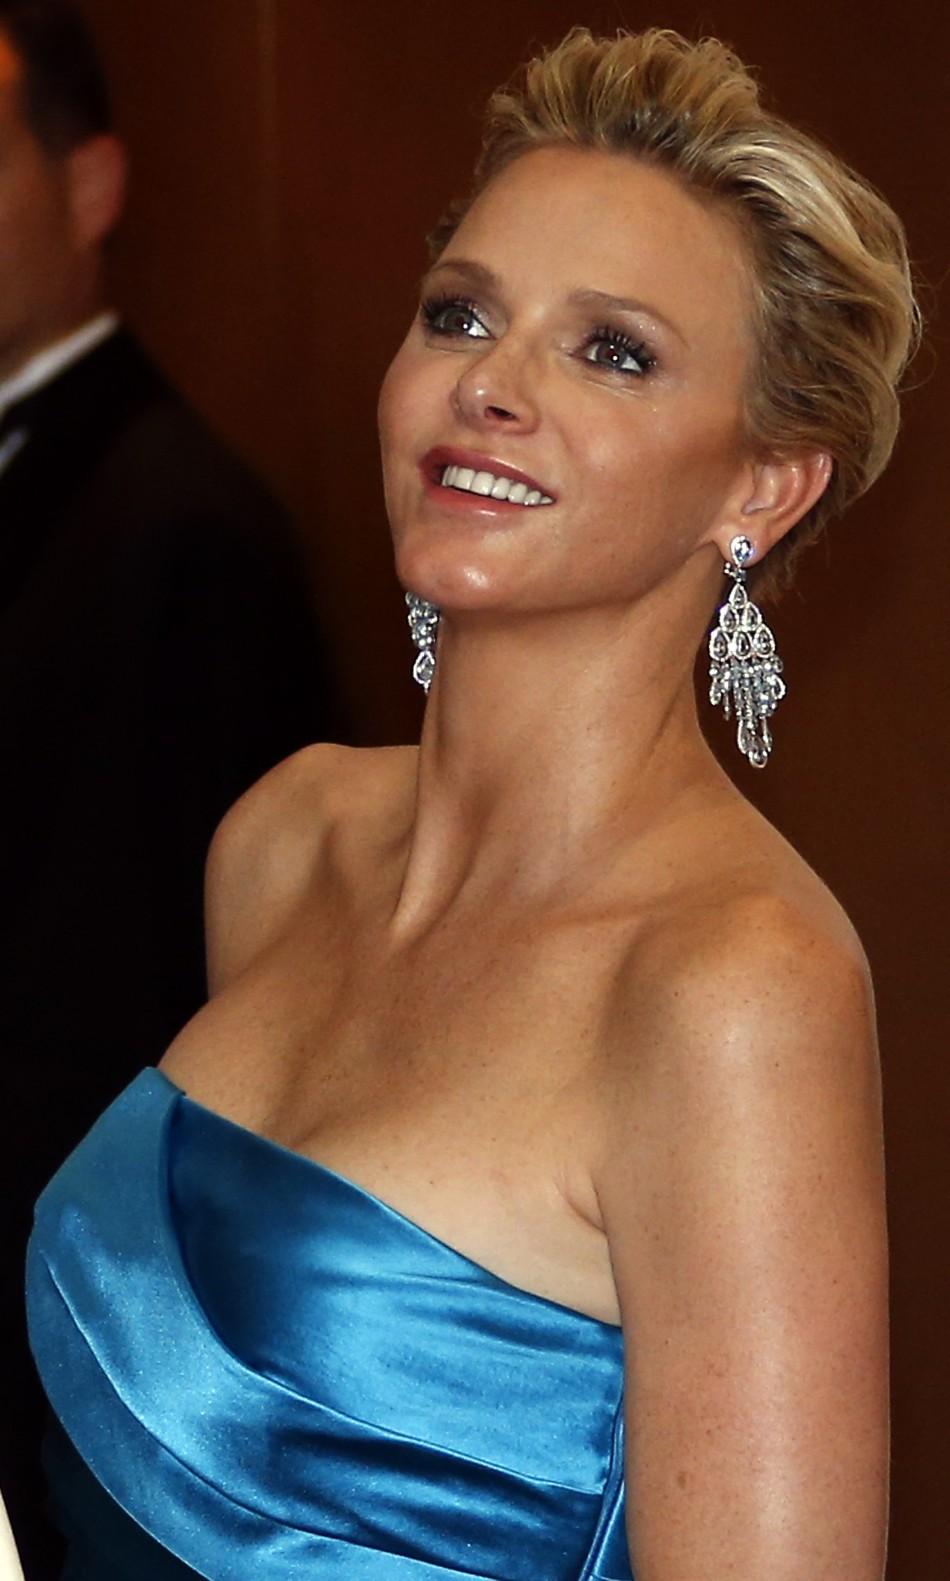 Monaco S Princess Charlene Shines In Satin Blue At Red